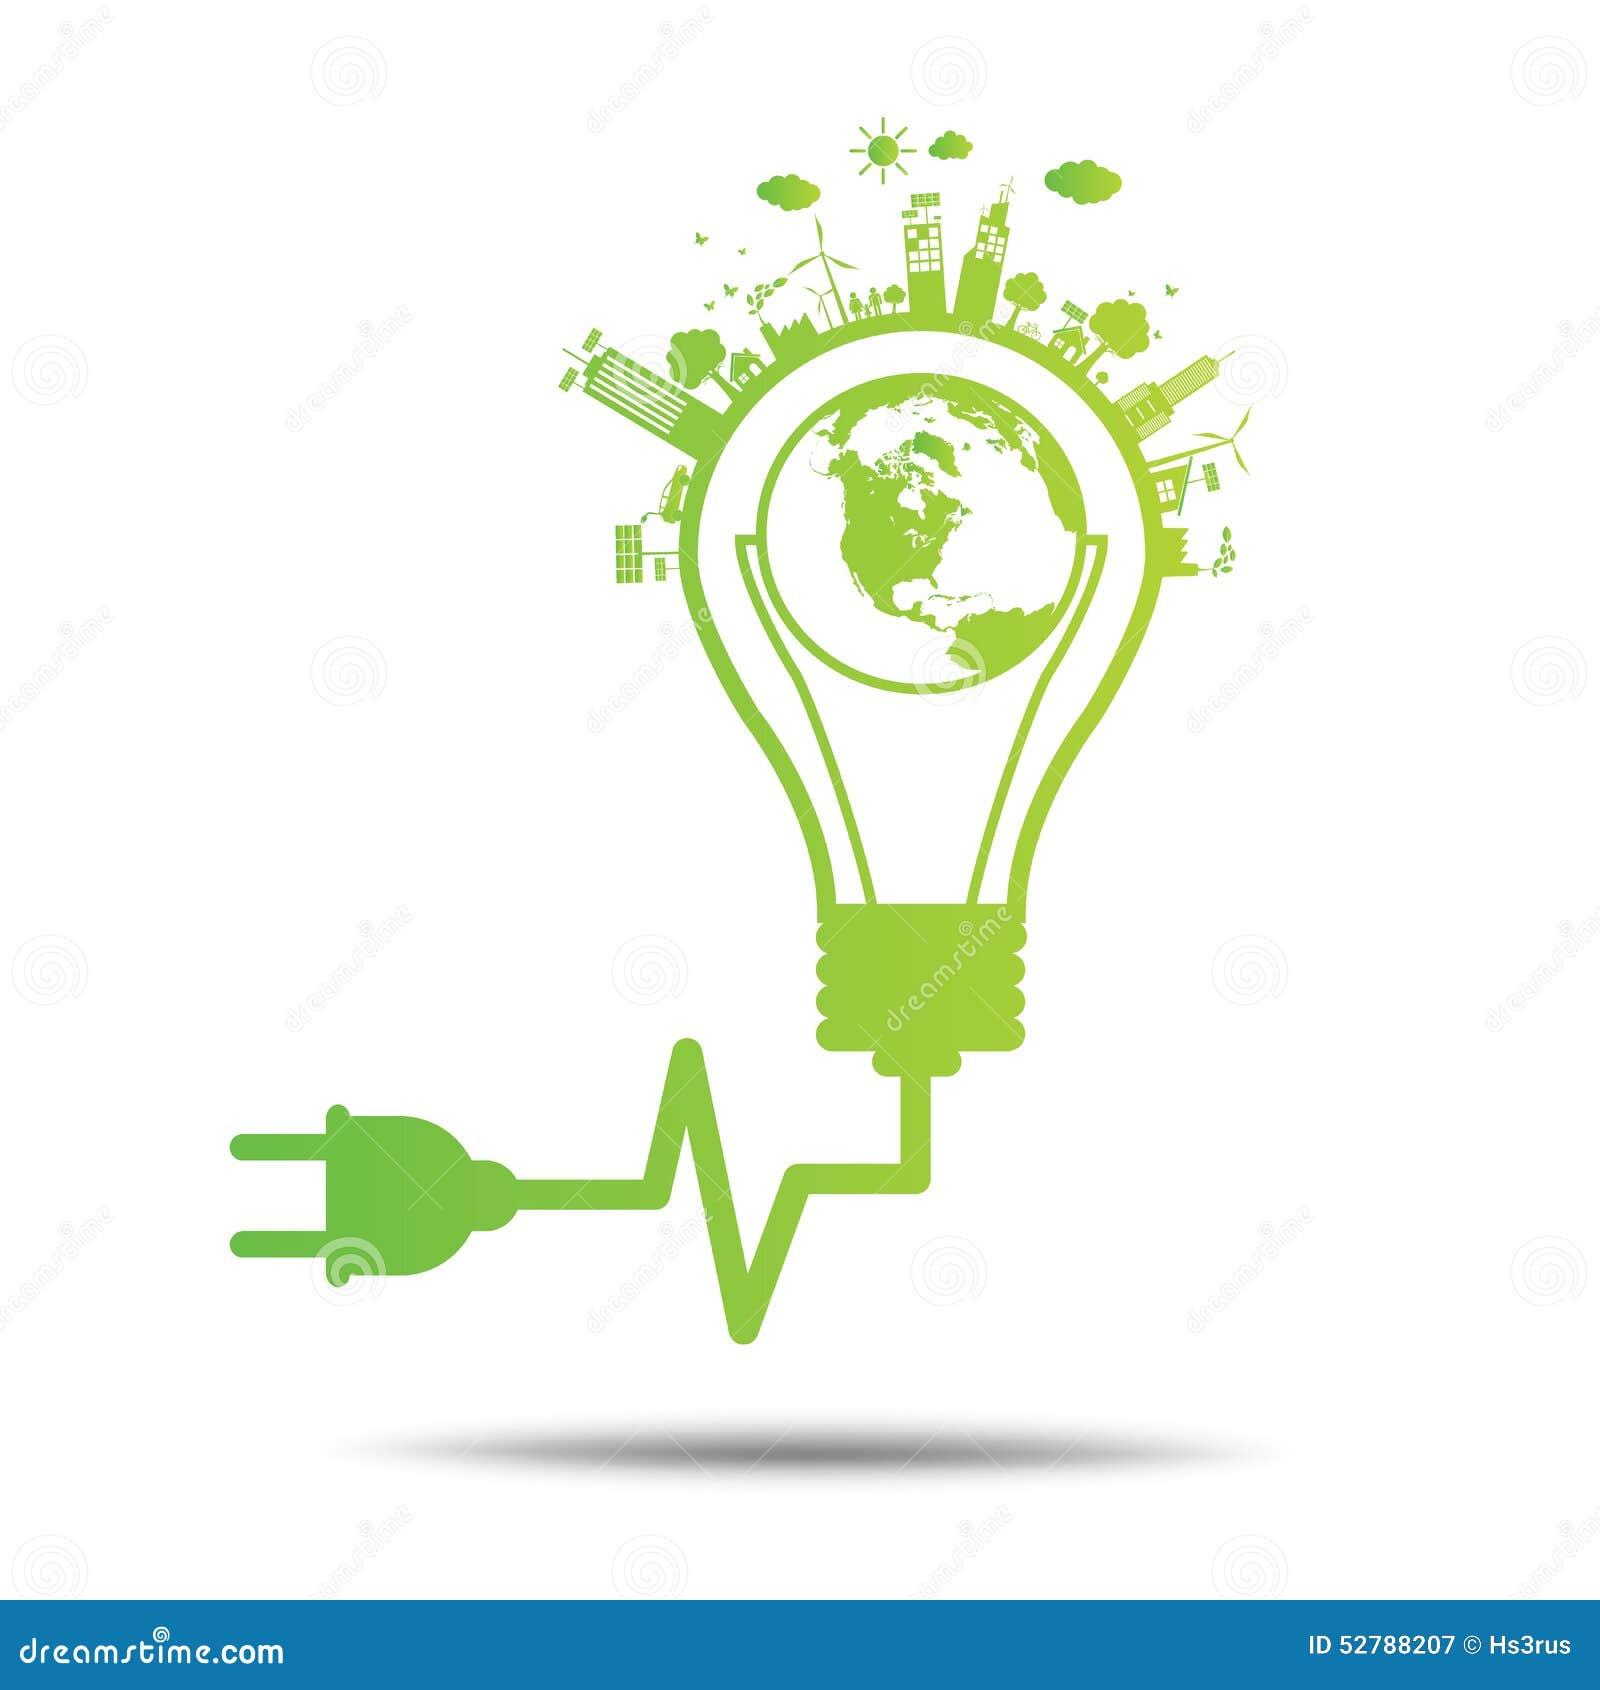 Power green concept idea ecology tree environmentally for Ideanature